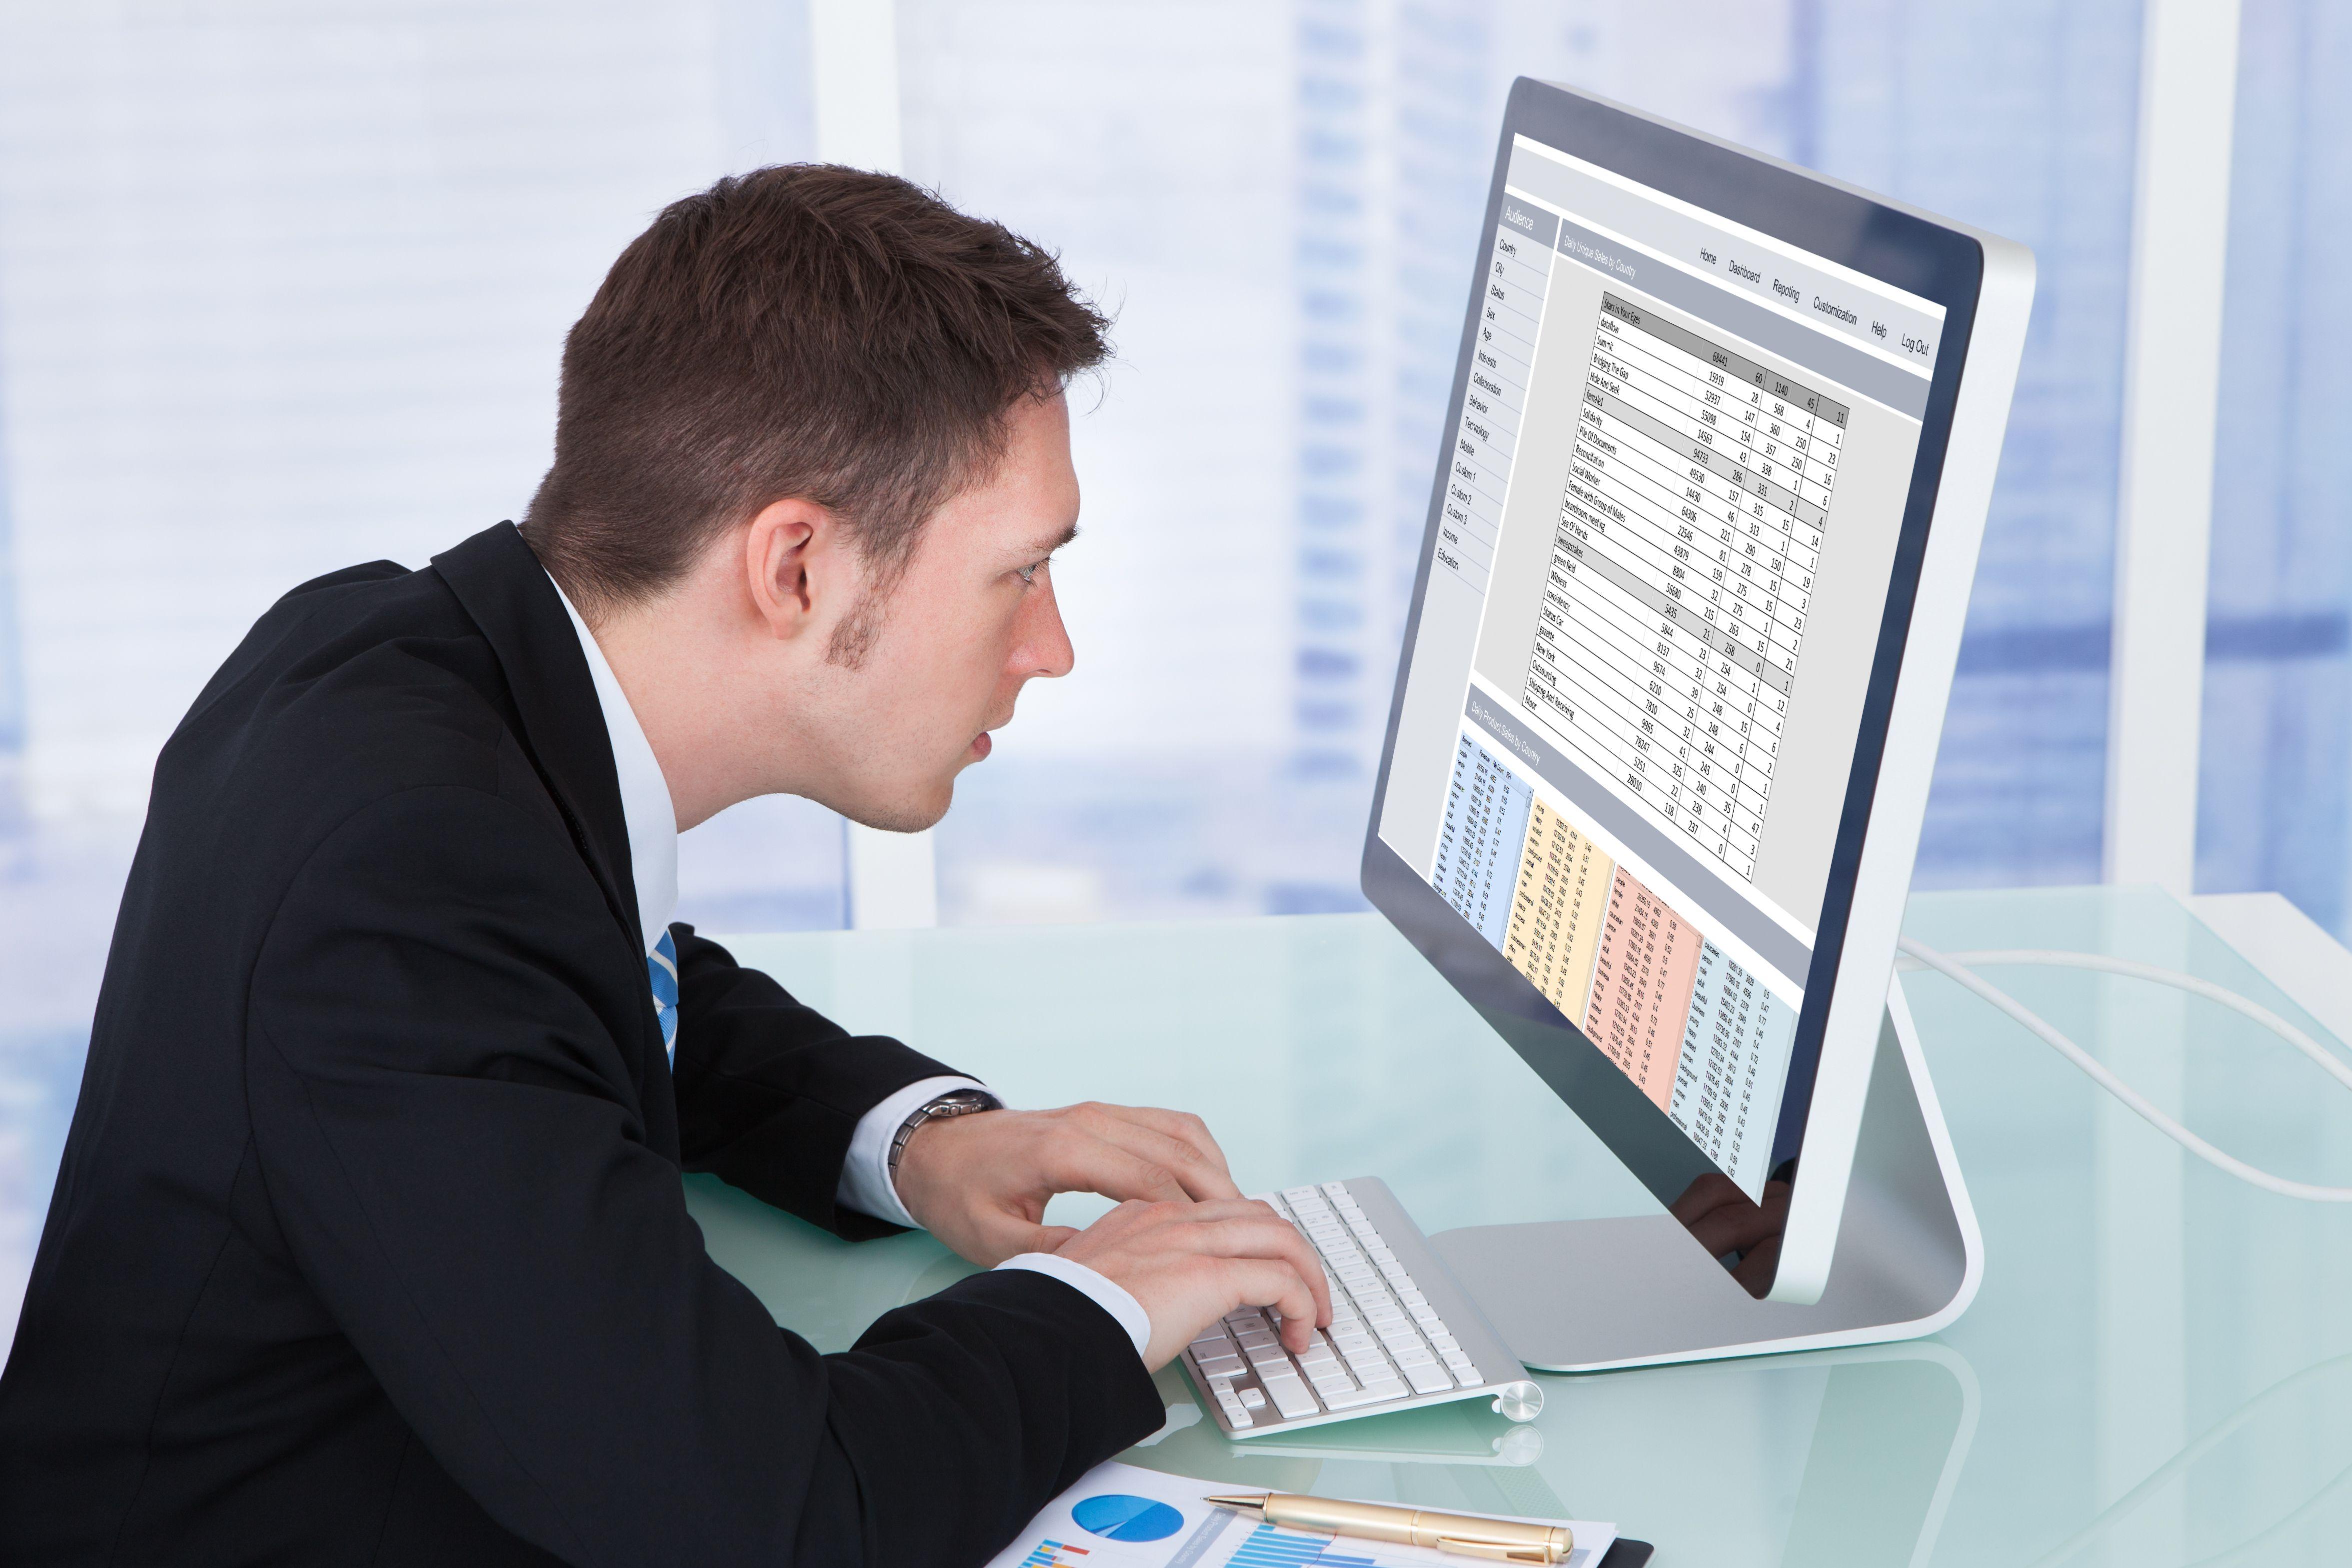 Kyphosis and forward head posture at the computer.